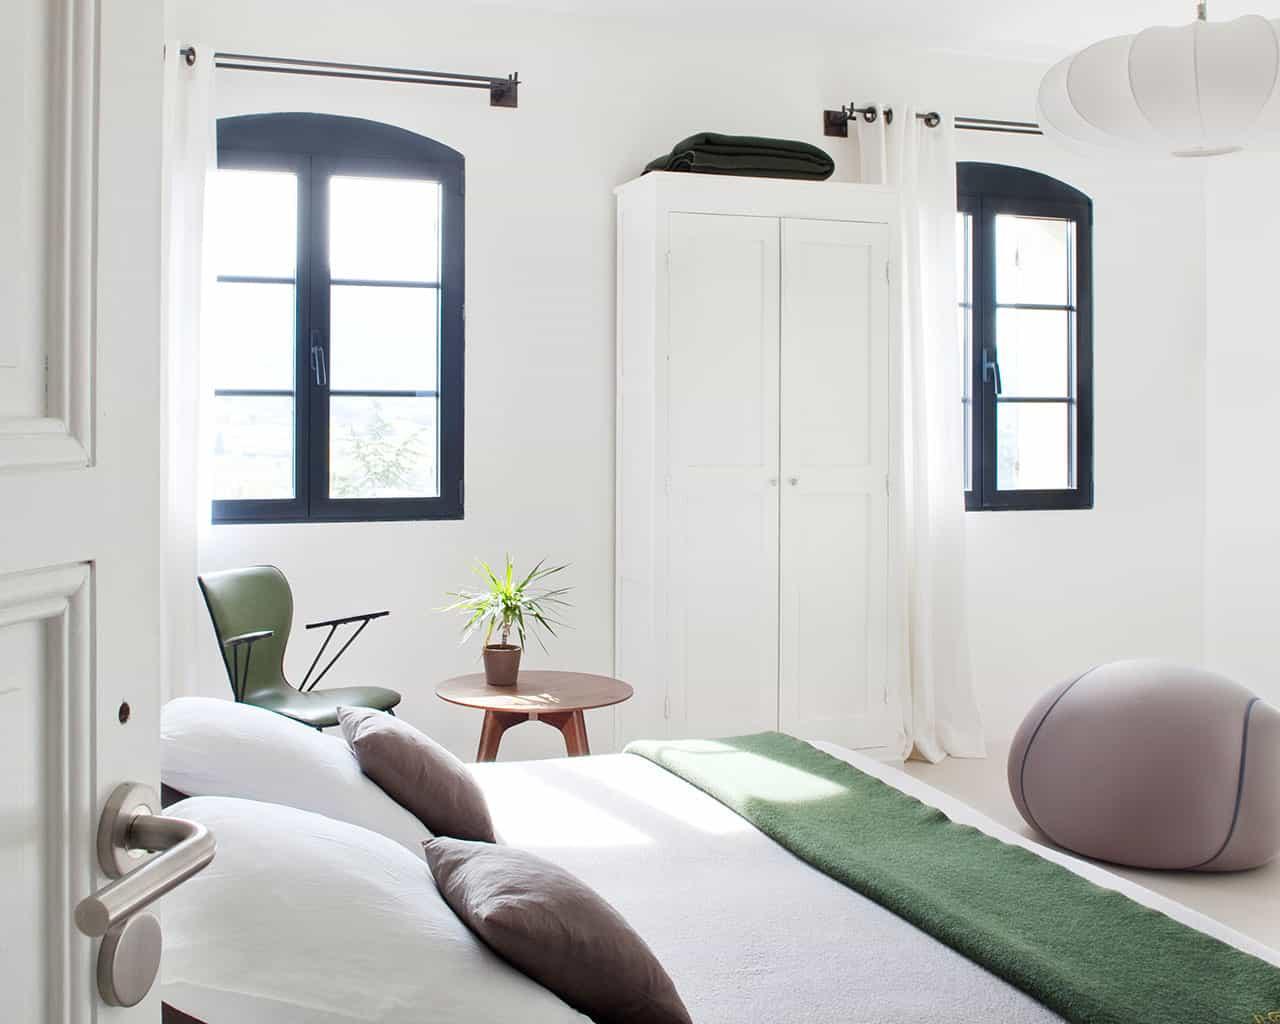 Chambre d'hôte luxe Luberon